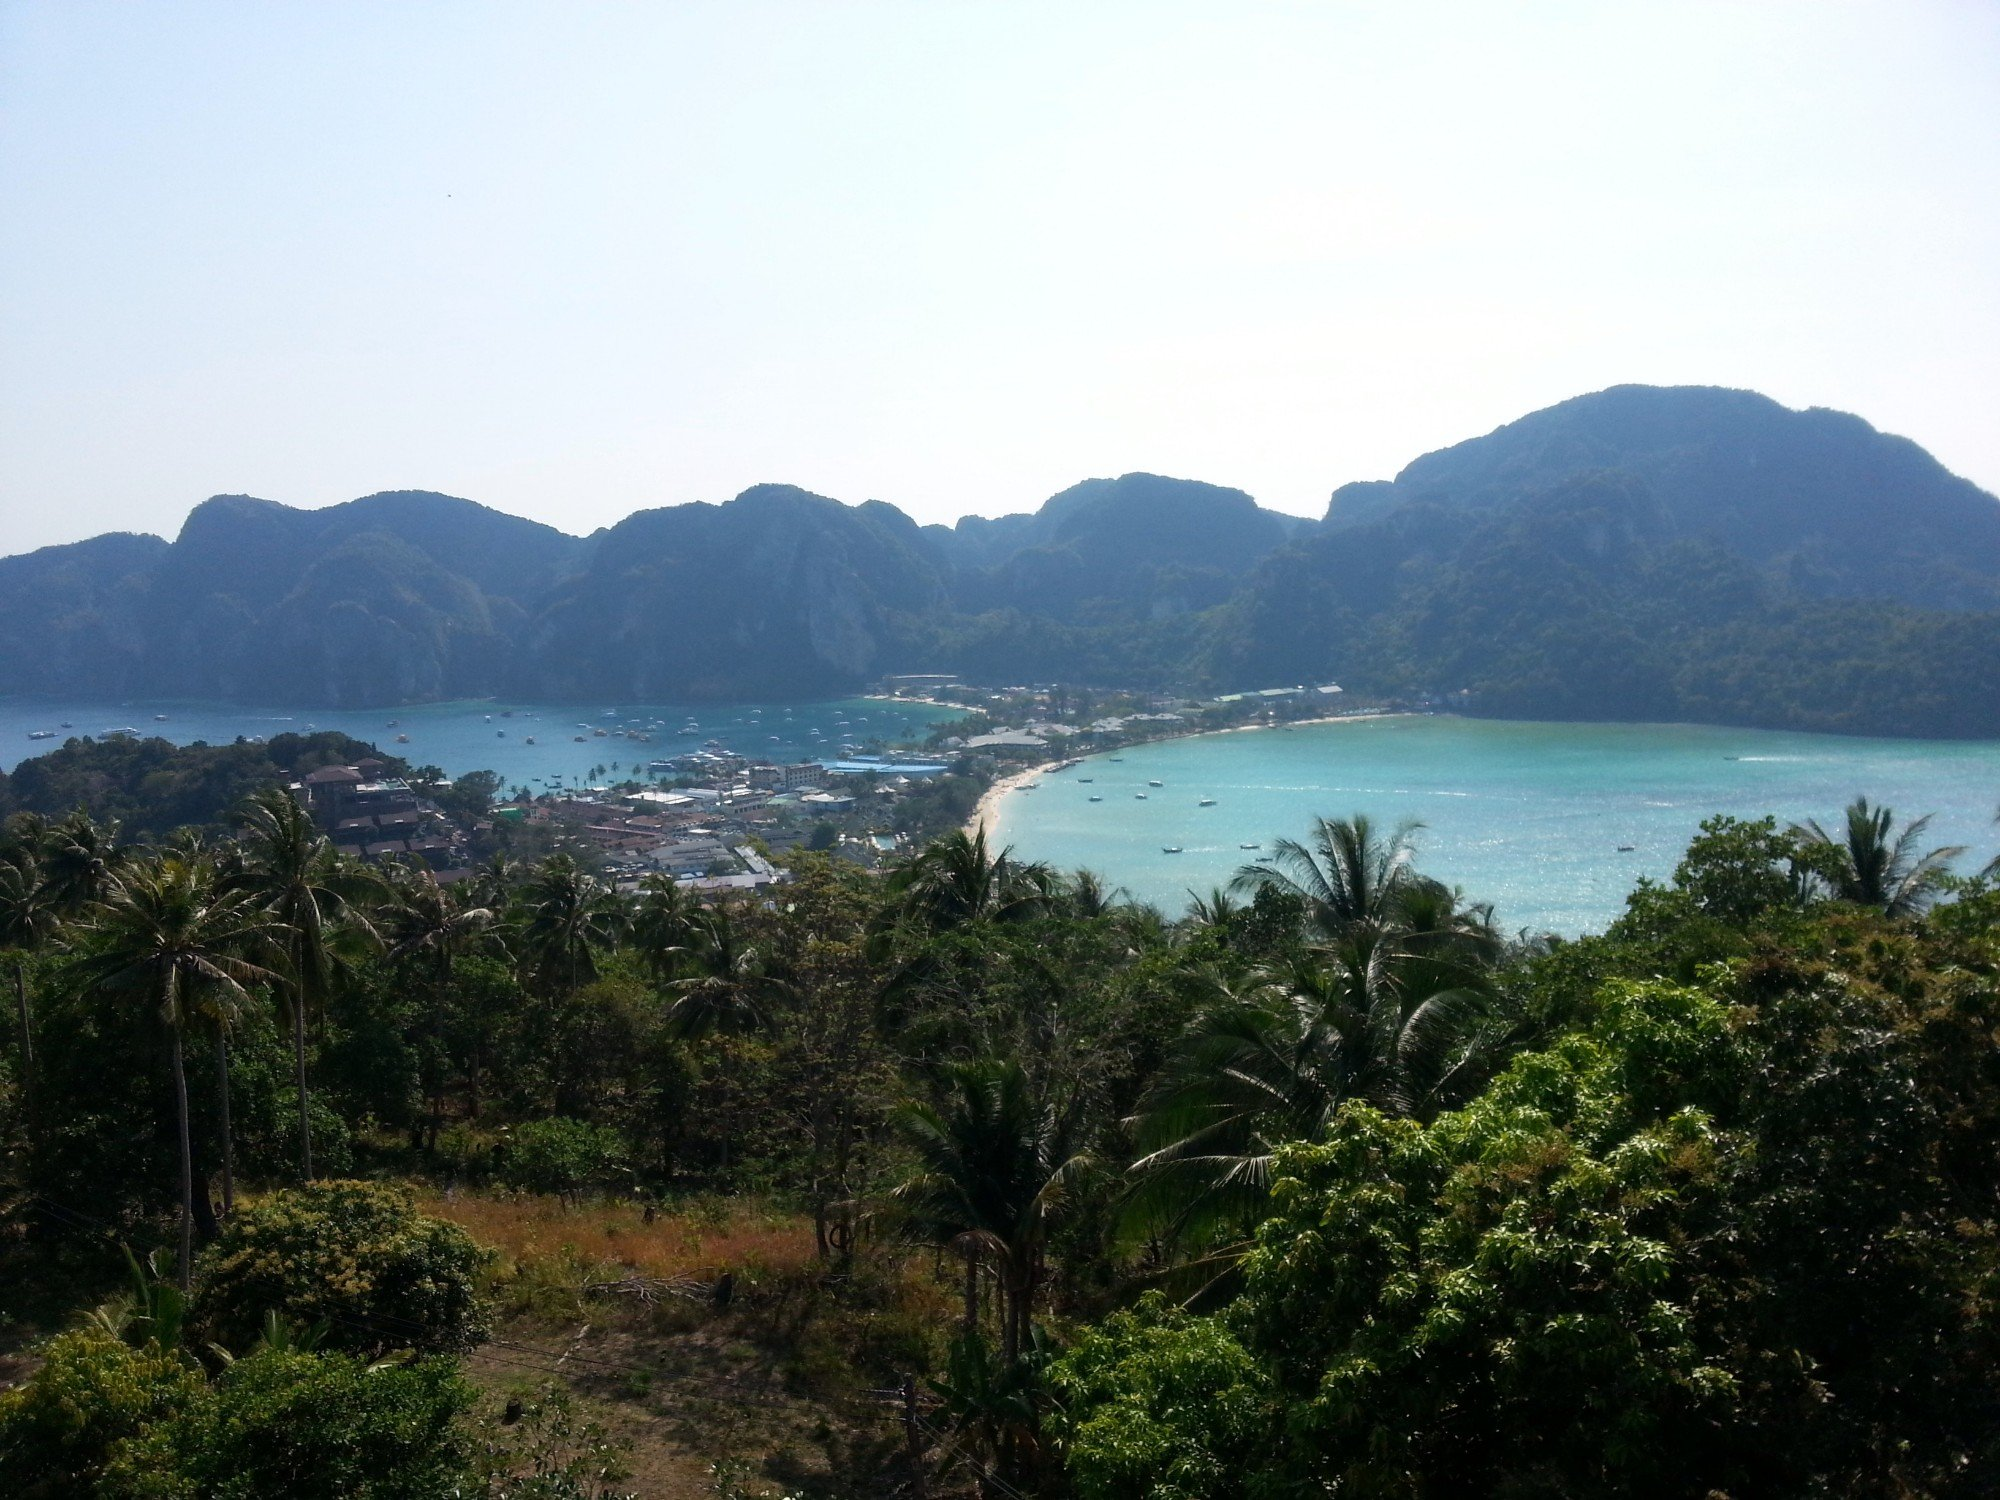 Viewpoint in Koh Phi Phi